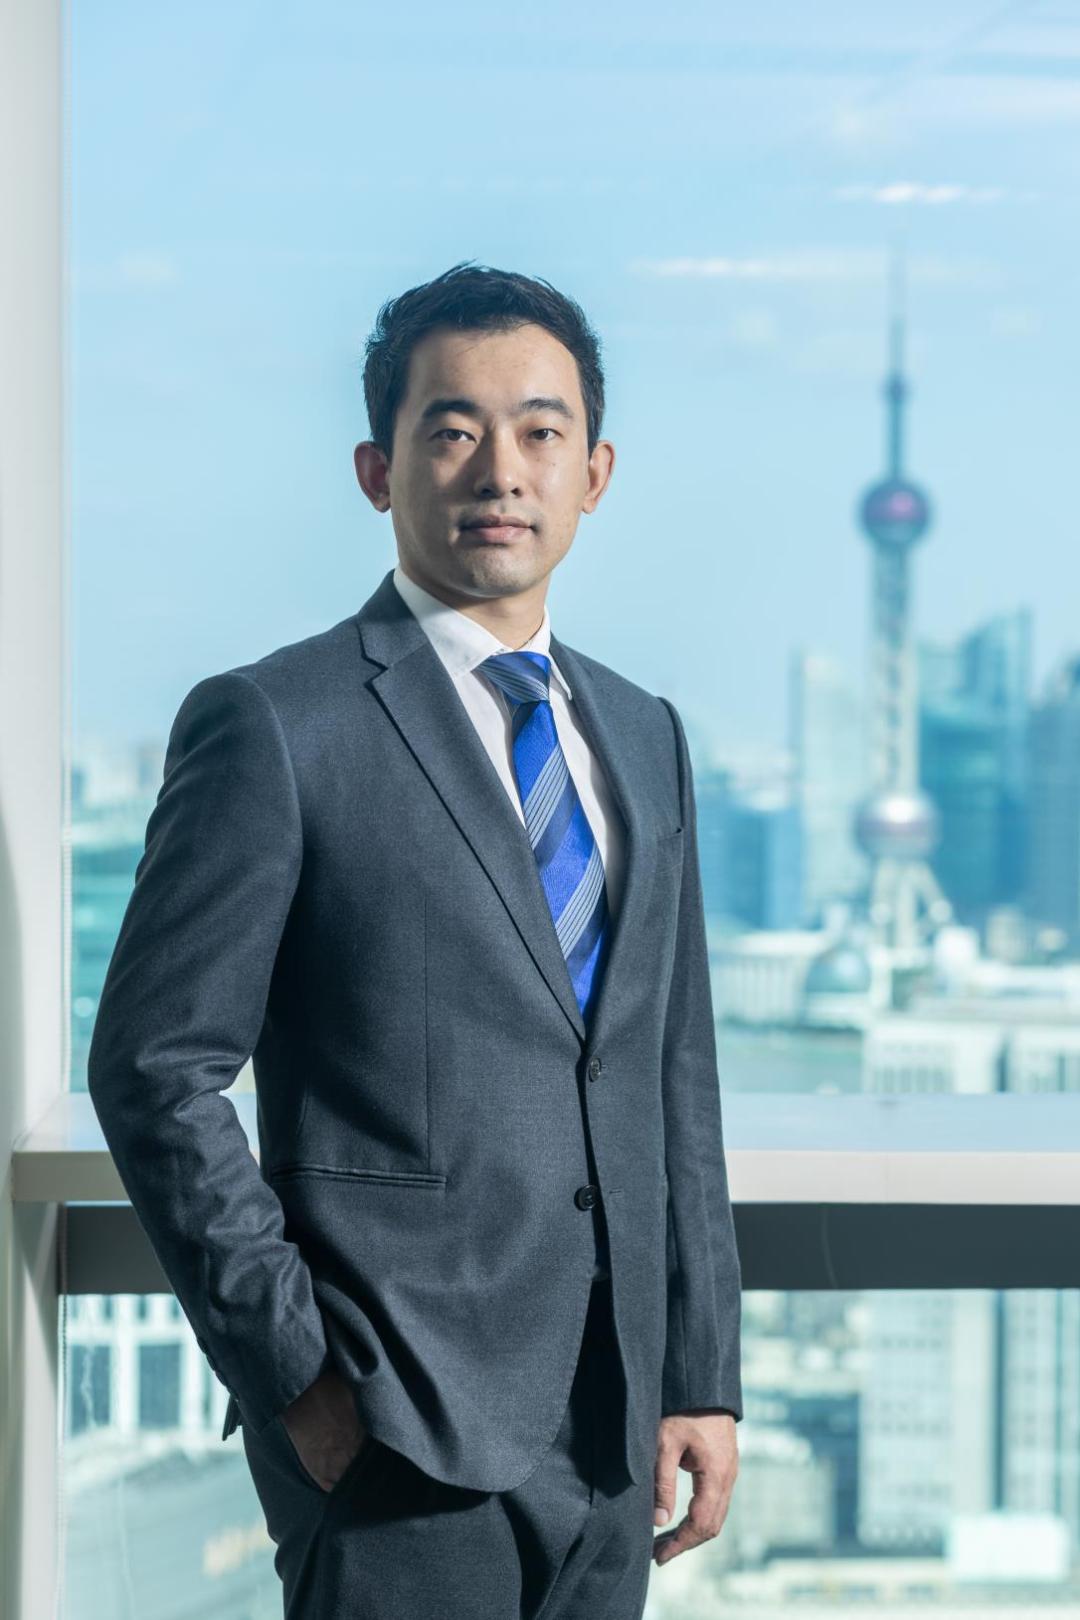 LB Investment中国负责人包磊:投资拥有未来企业家潜质的创业者